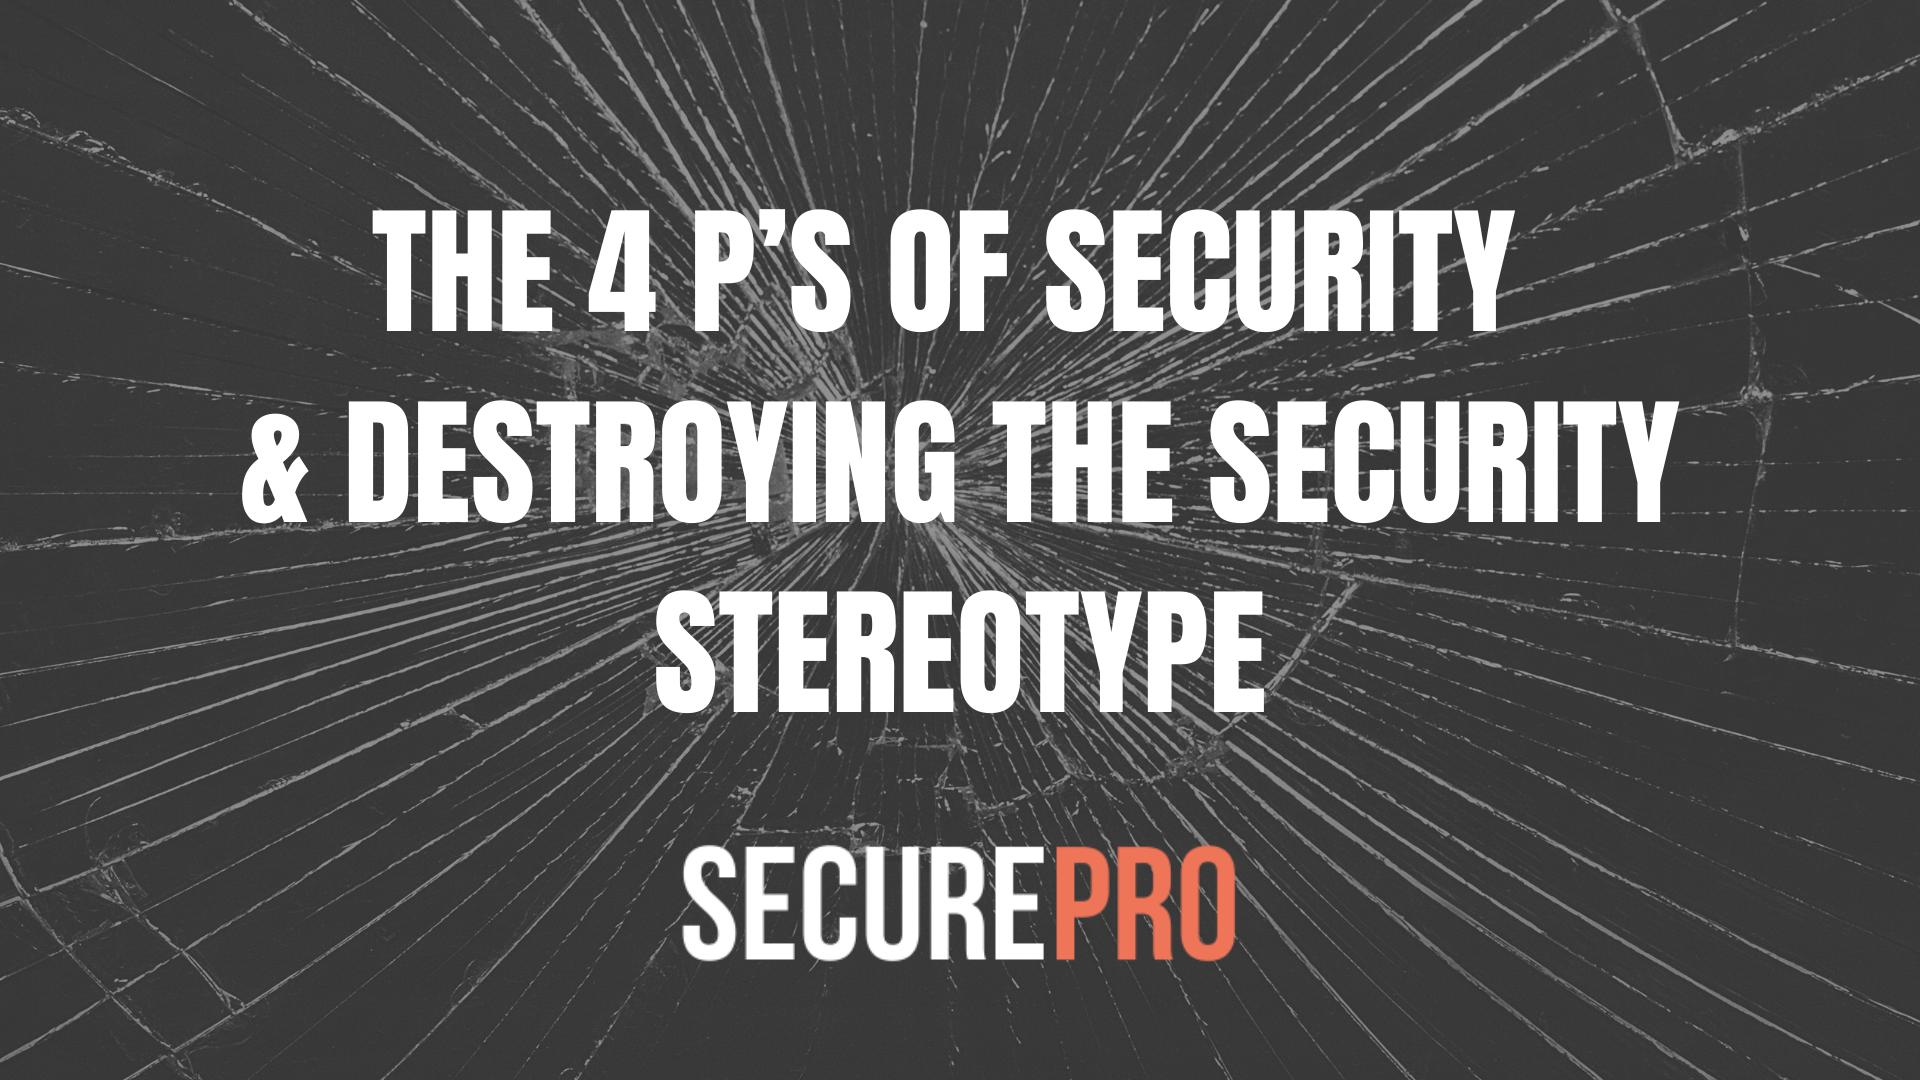 SecurePro Birmingham - The 4p's of Security